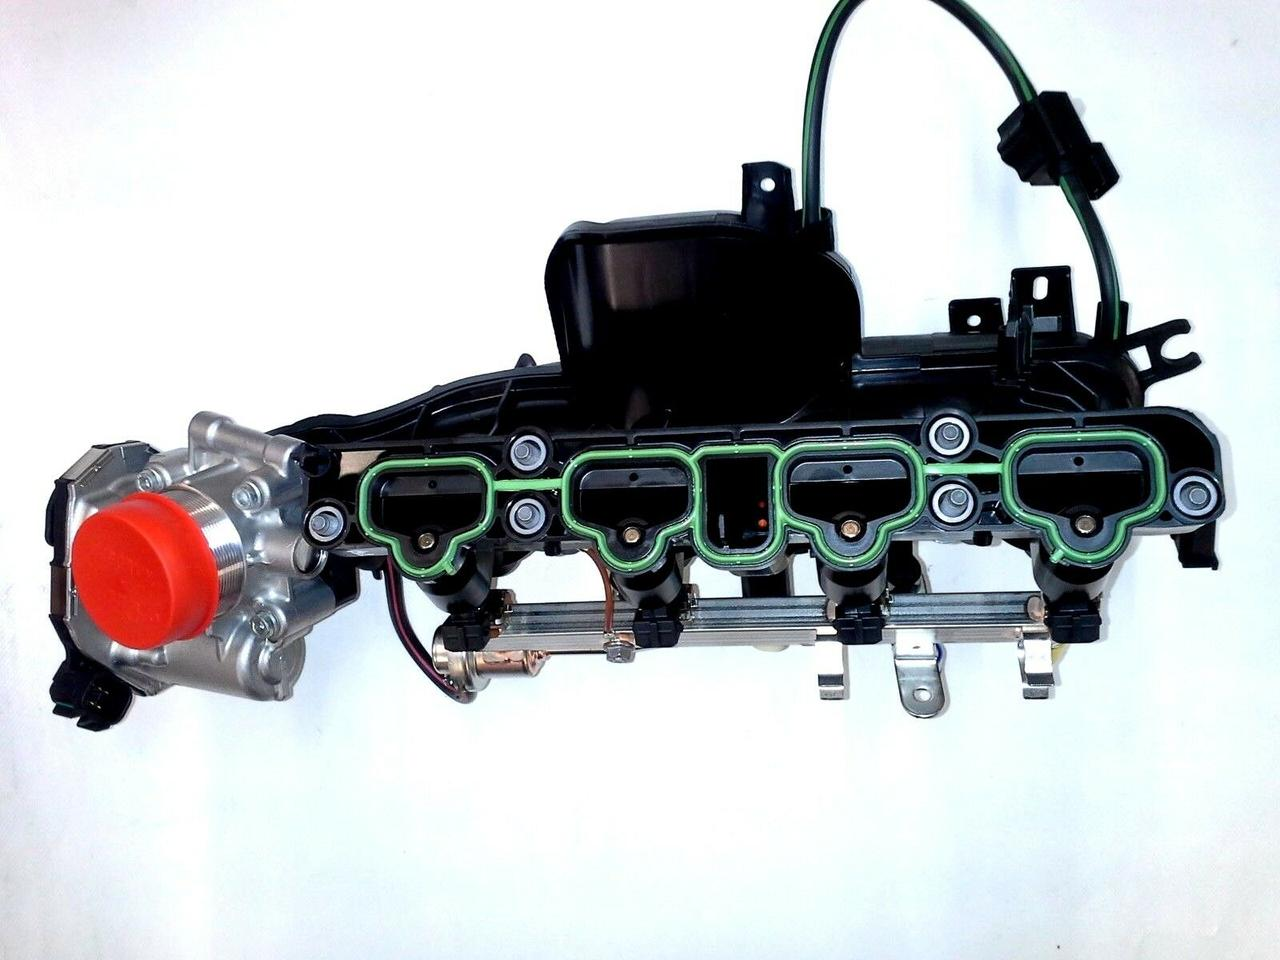 Коллектор впускной GM 55581015 A14NEL B14NEL A14NET B14NET OPEL Astra-J & CHEVROLET Cruze